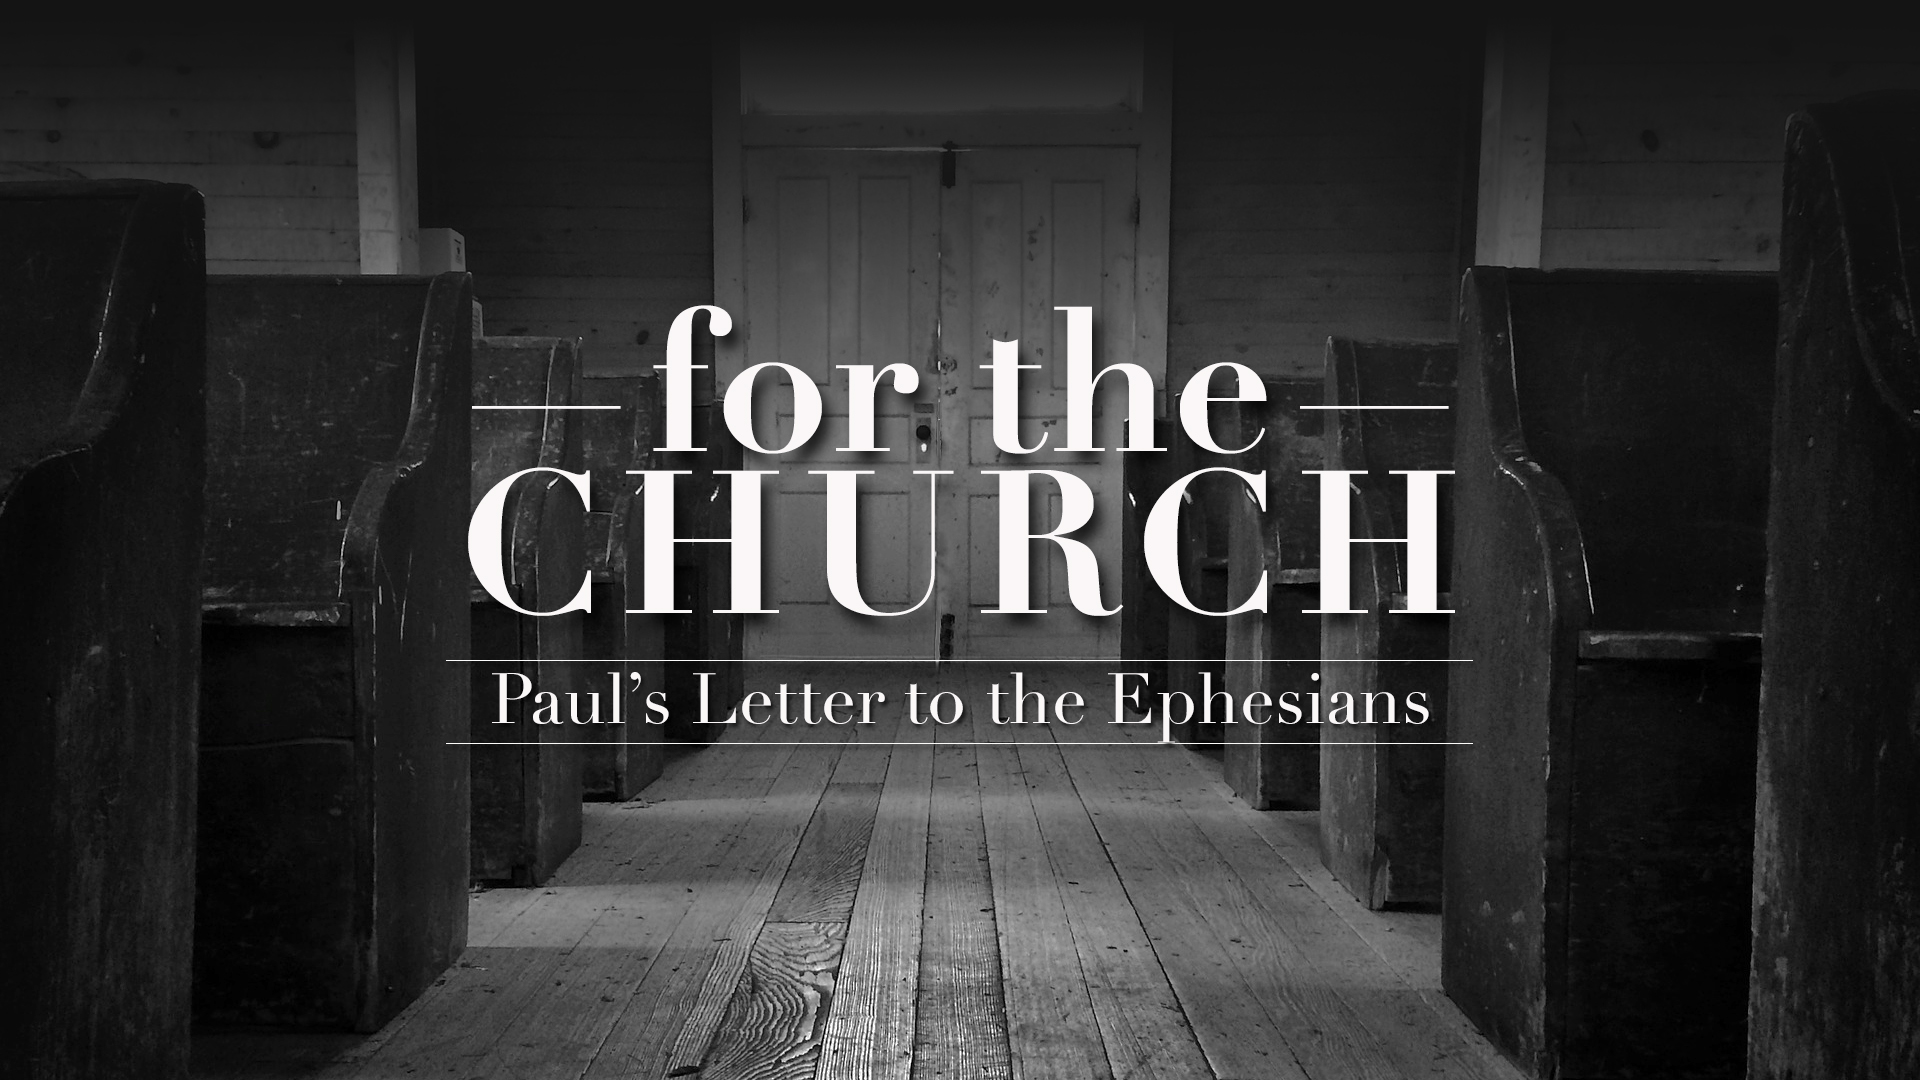 Ephesians - For the Church